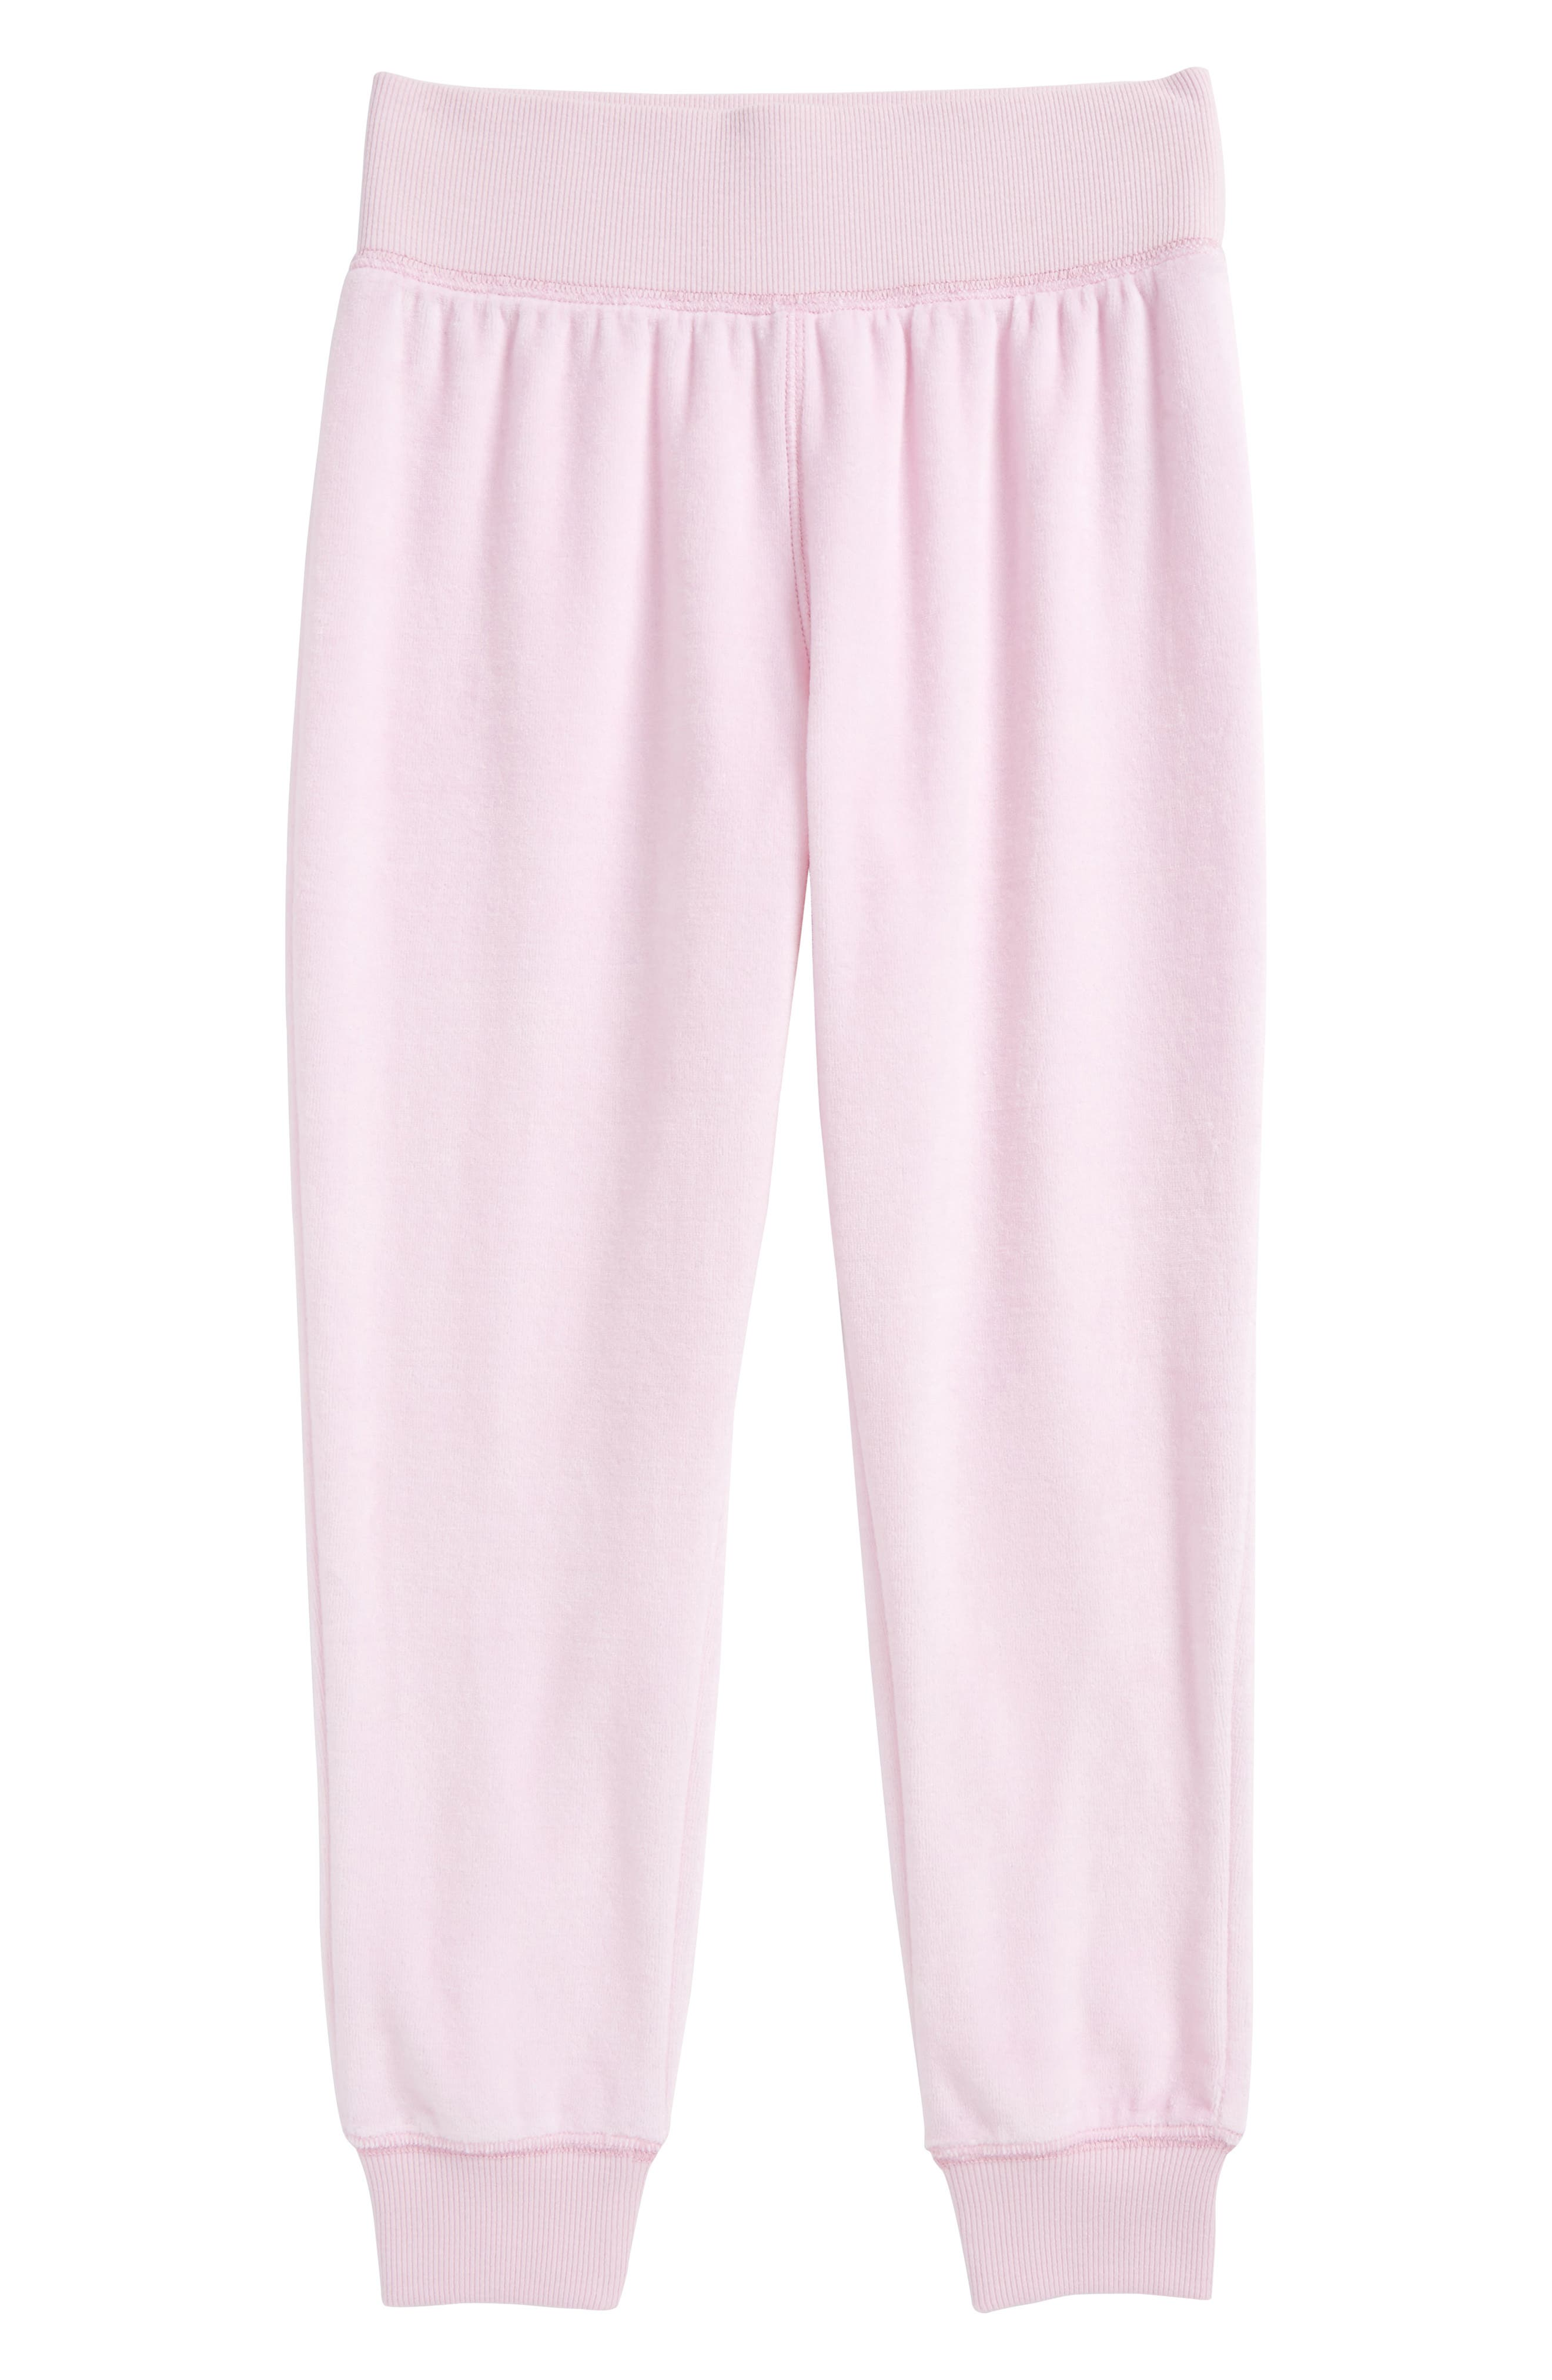 Zella High Waist Velour Jogger Pants,                         Main,                         color, 680